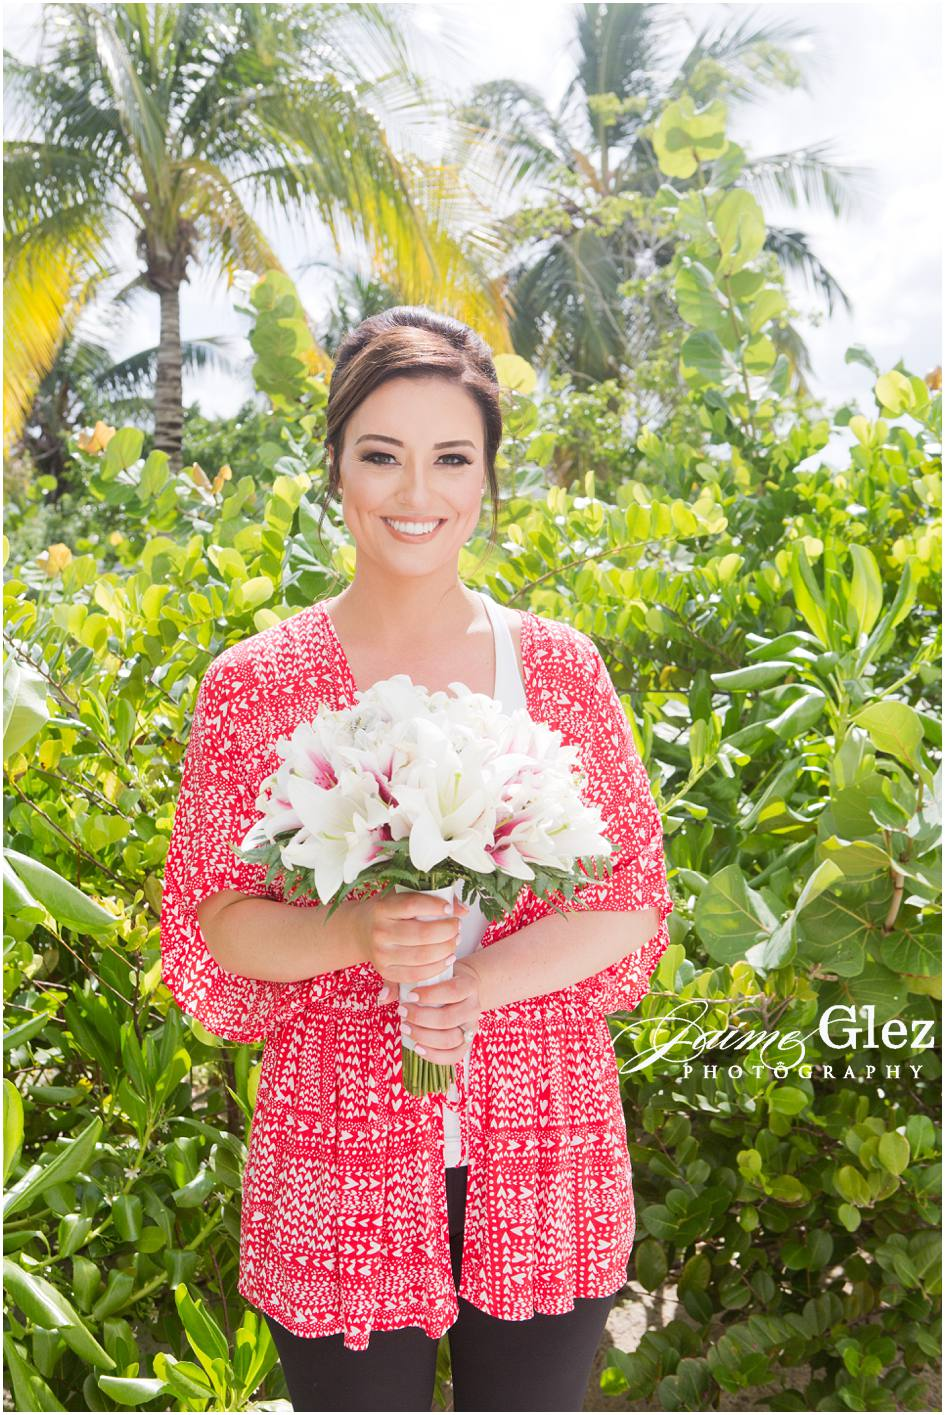 finest playa mujeres wedding photography 4